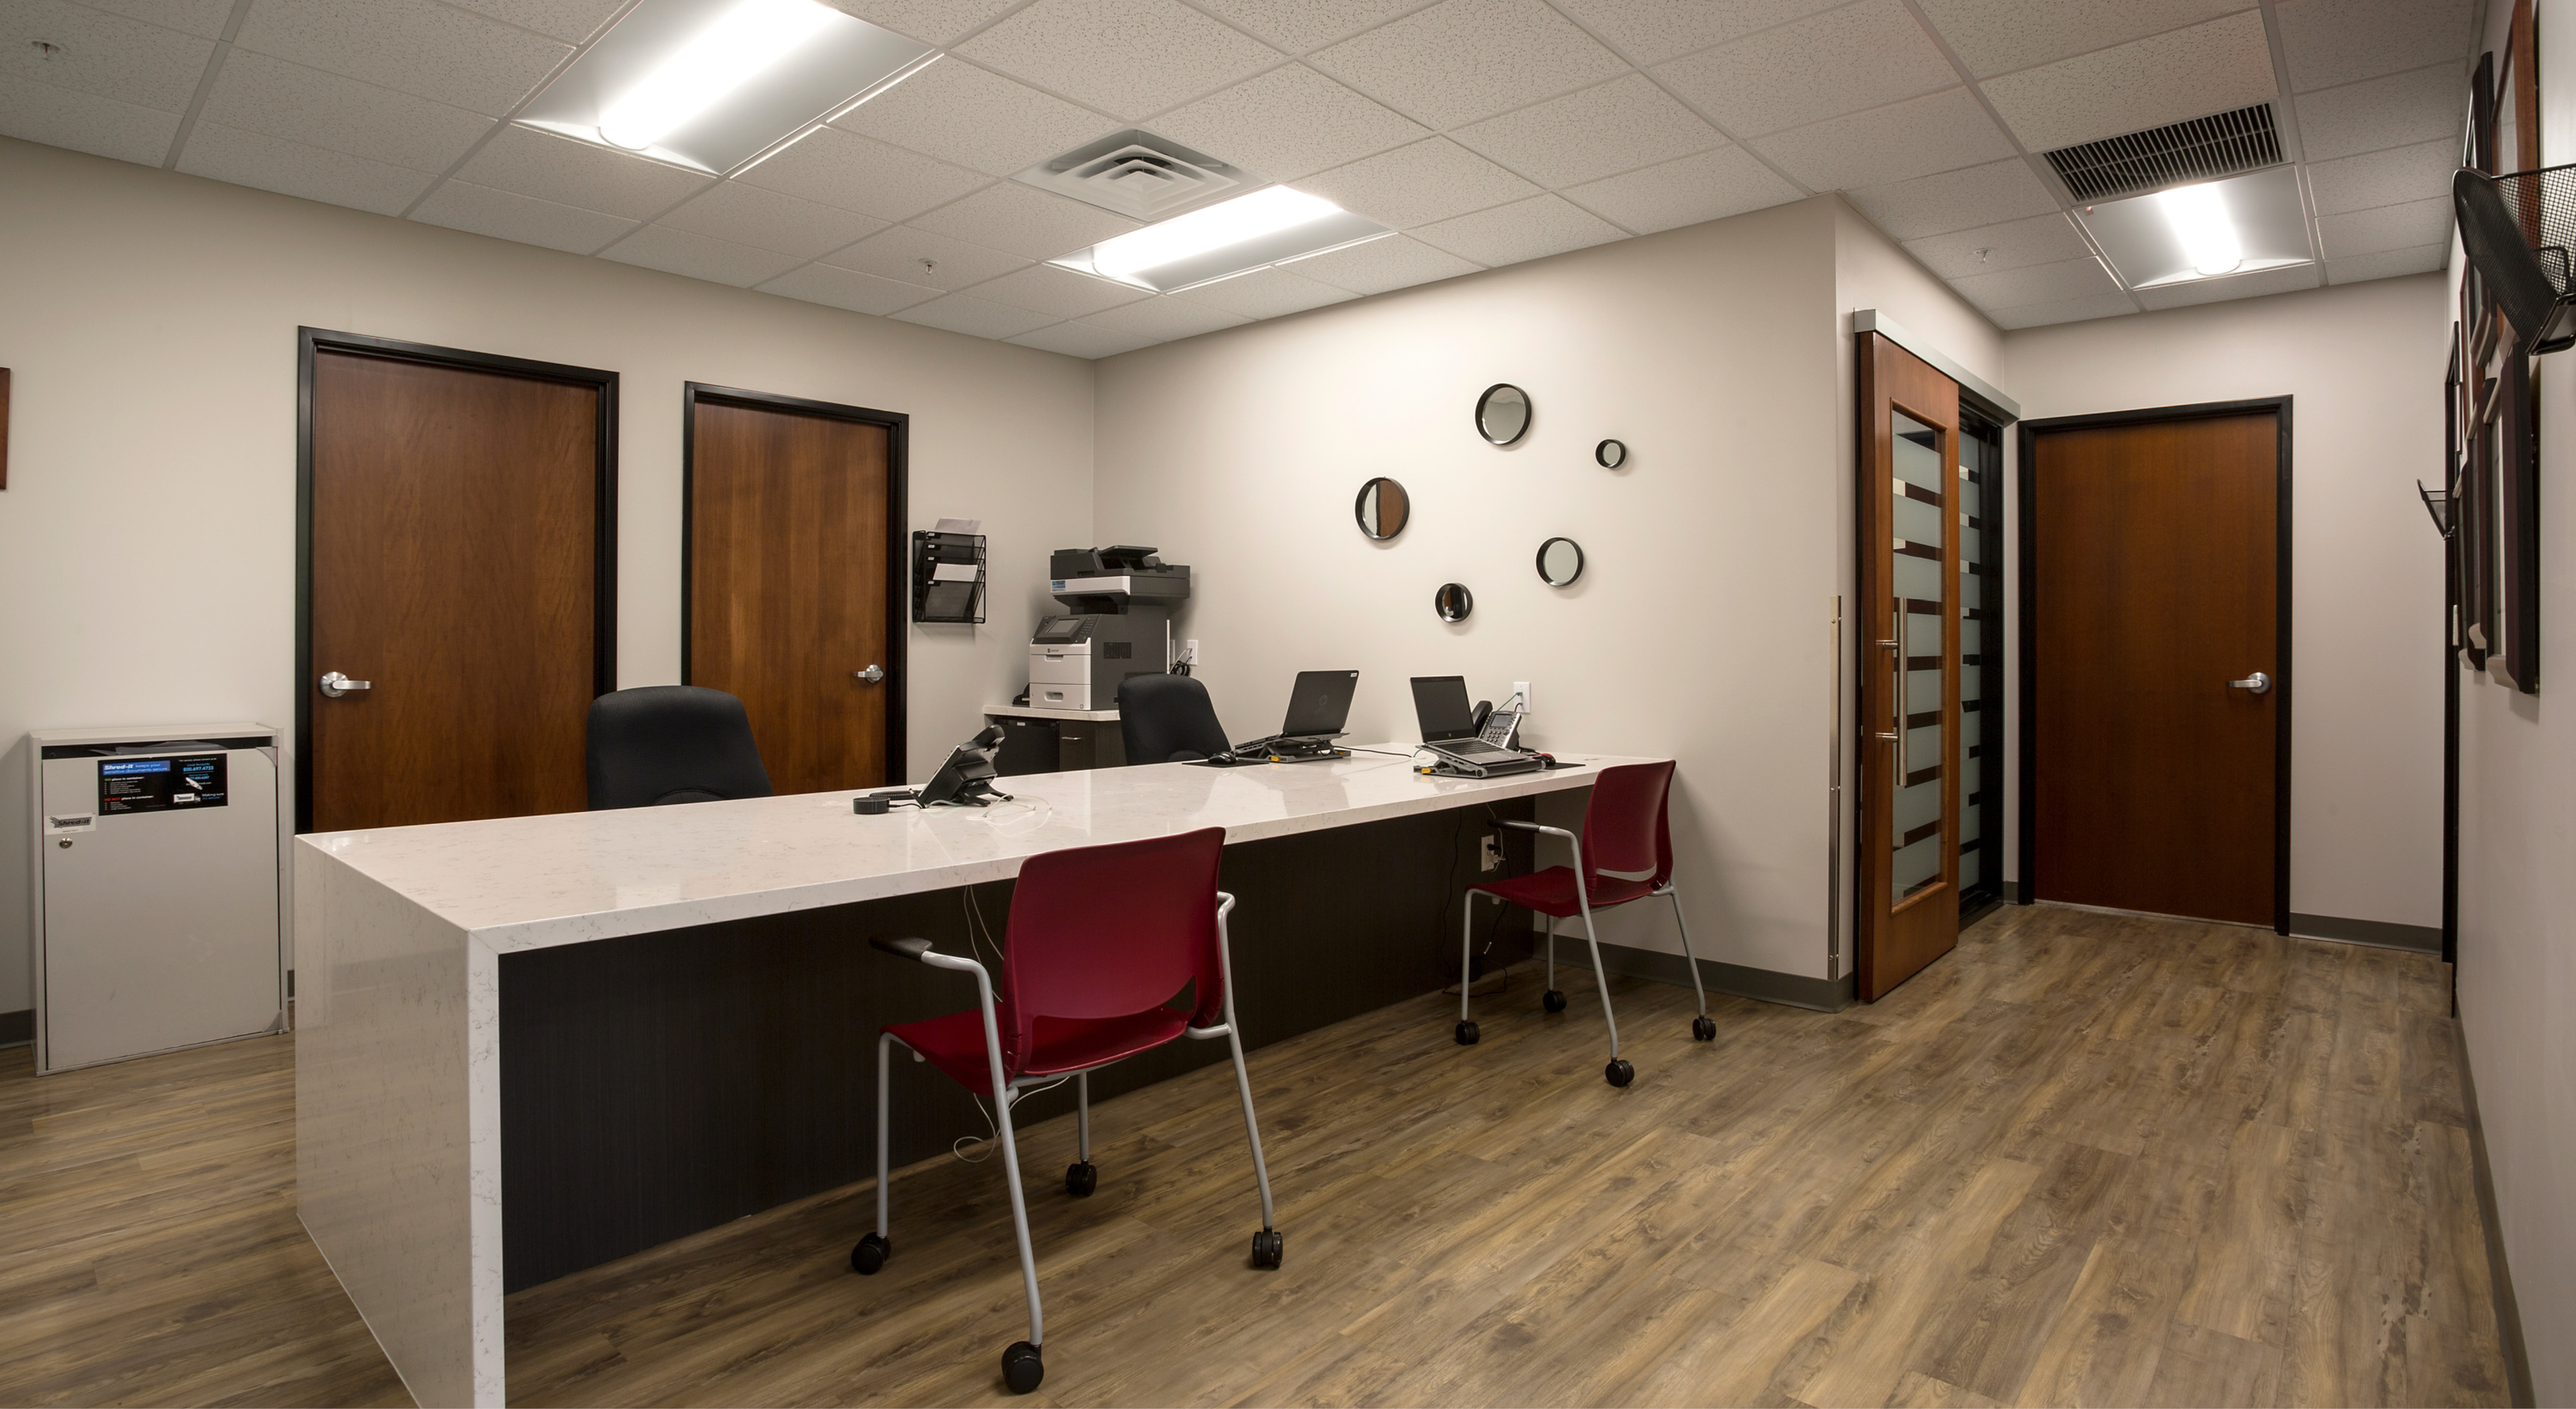 Arizona Desert Ear, Nose & Throat Specialists open office